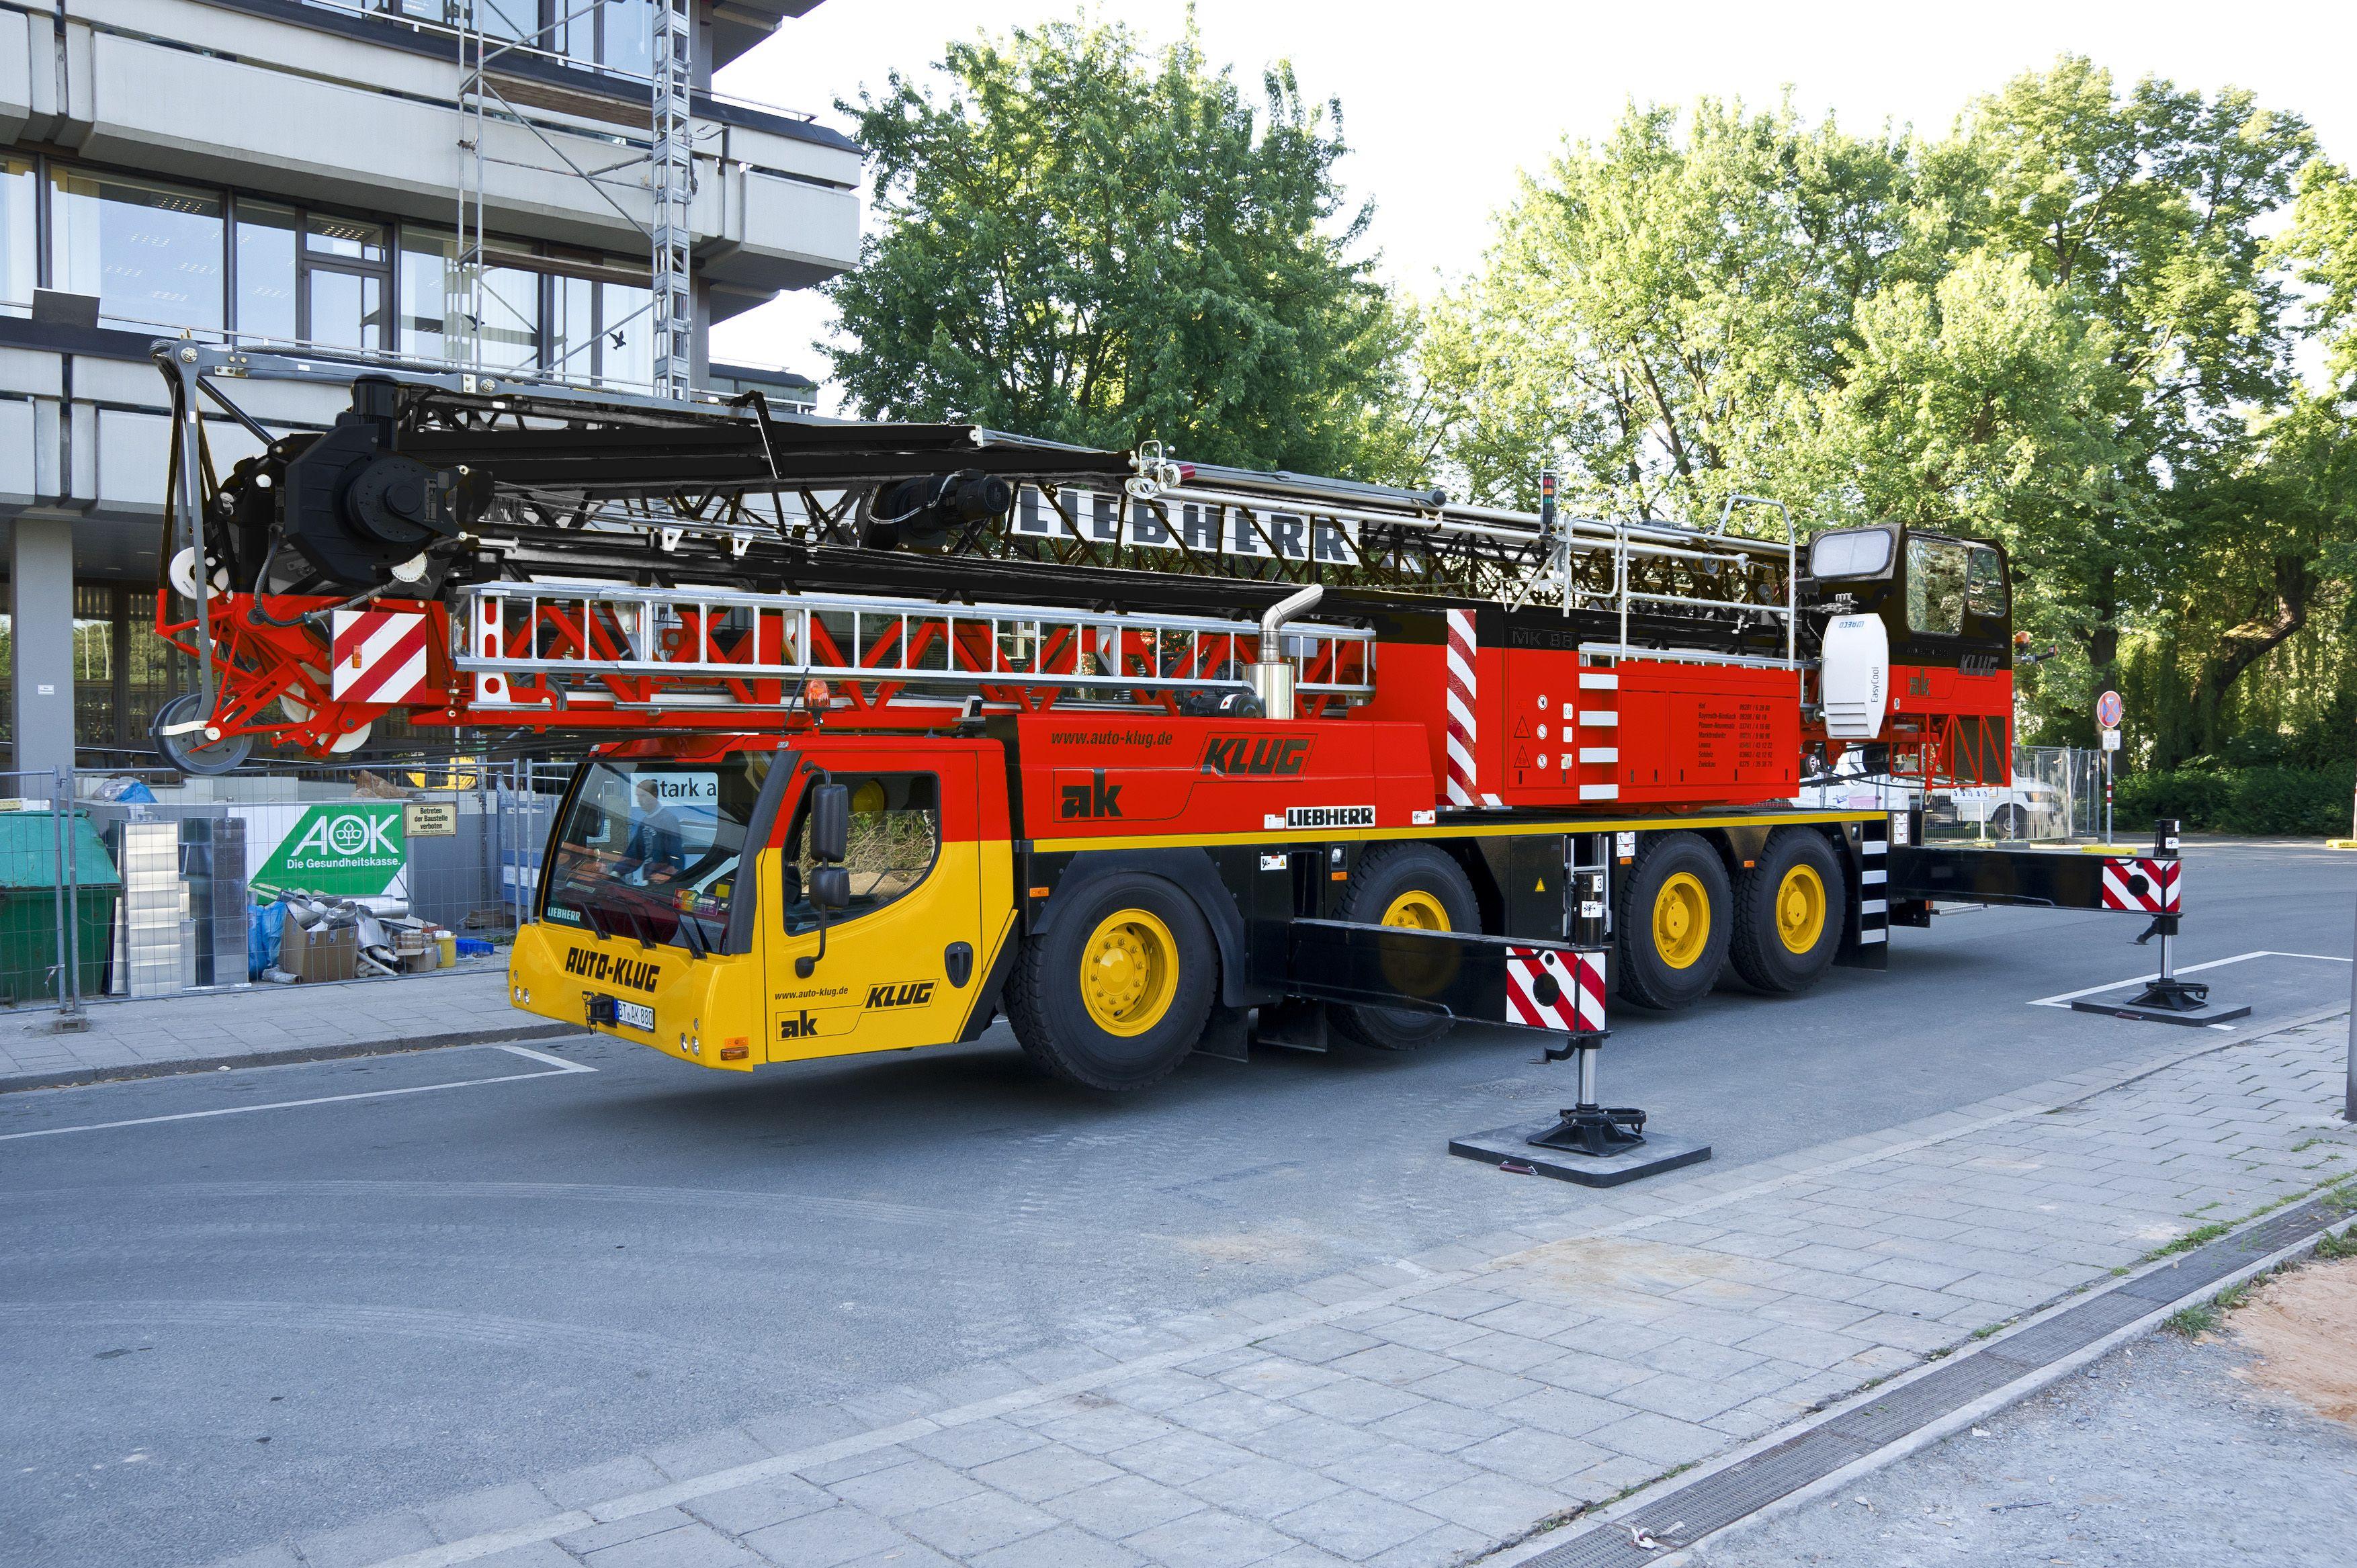 liebherr the mobile construction crane mk 88 representing germany worldcup 2014 pinterest. Black Bedroom Furniture Sets. Home Design Ideas